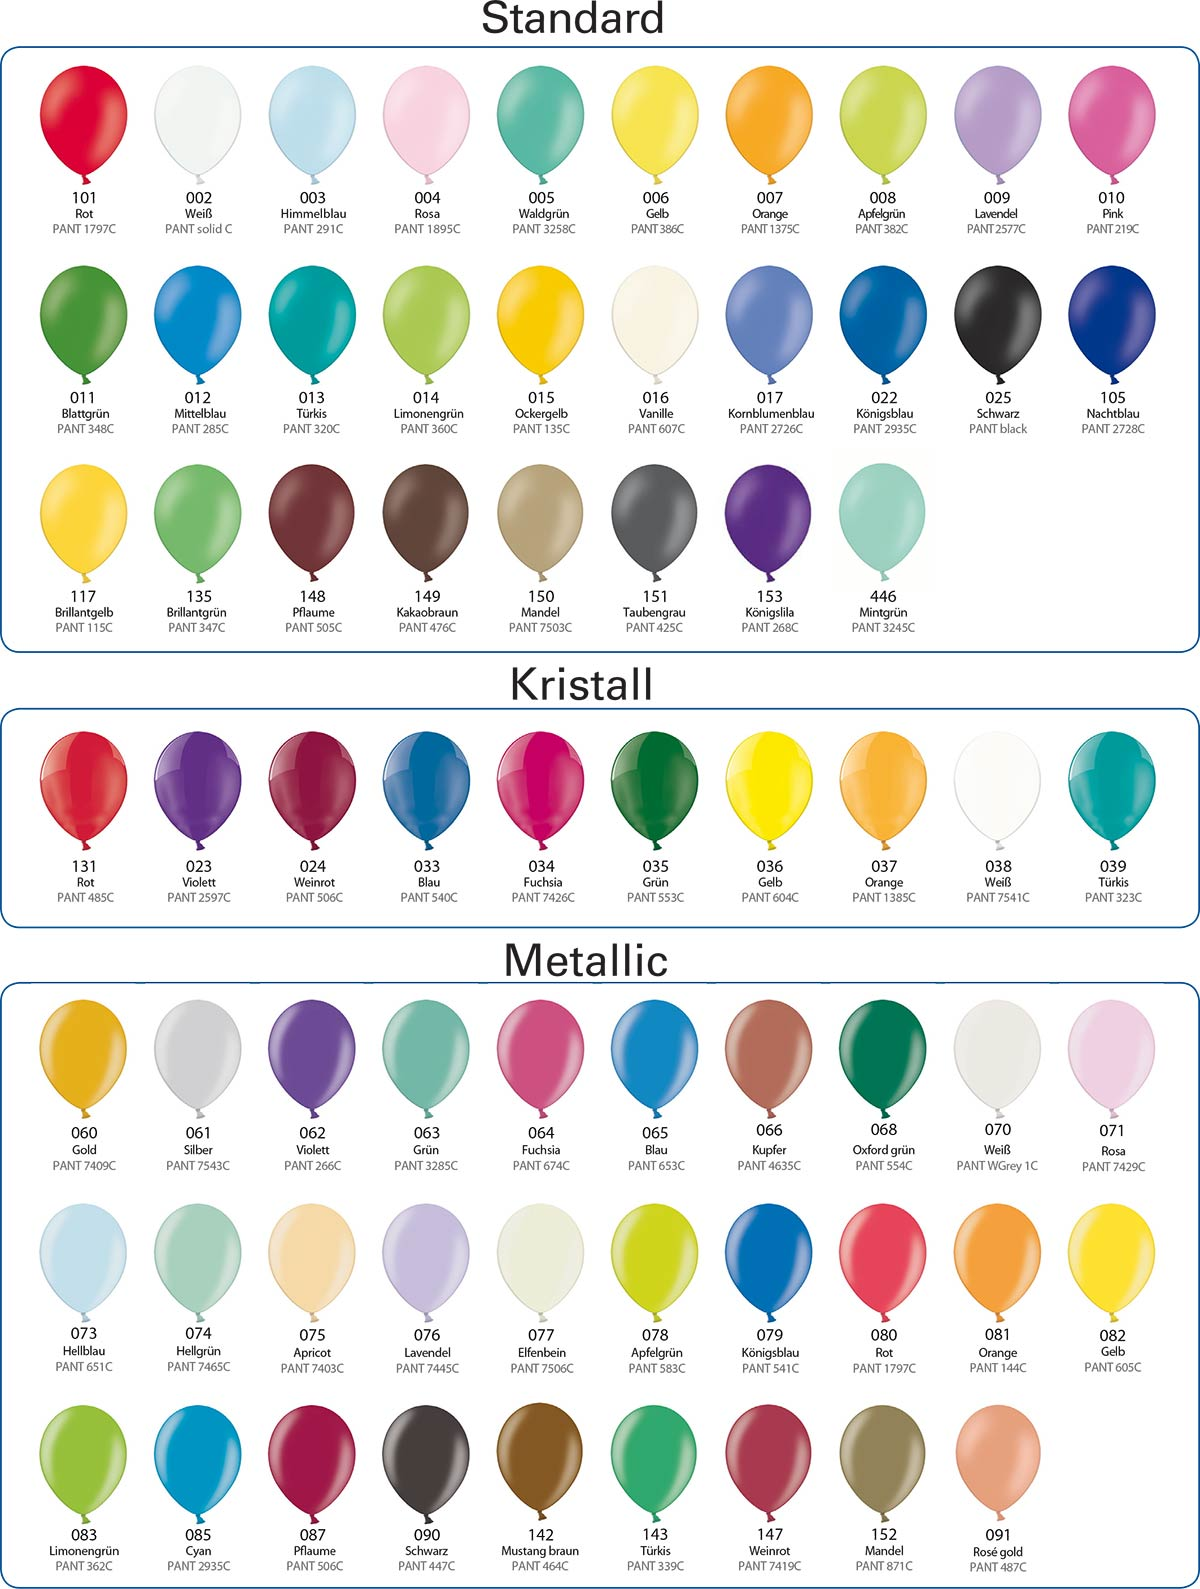 Available balloon colors of www.westeifel-ballons.com